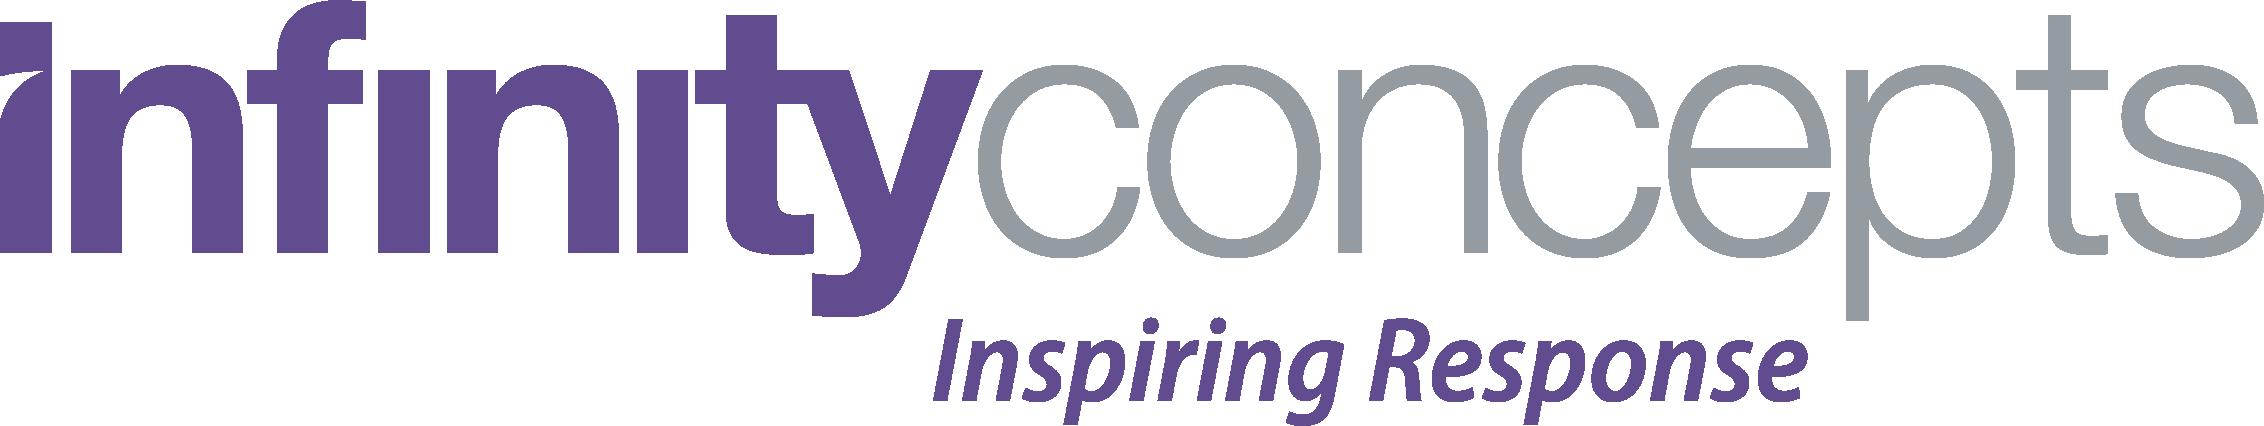 infinityconcepts Logo